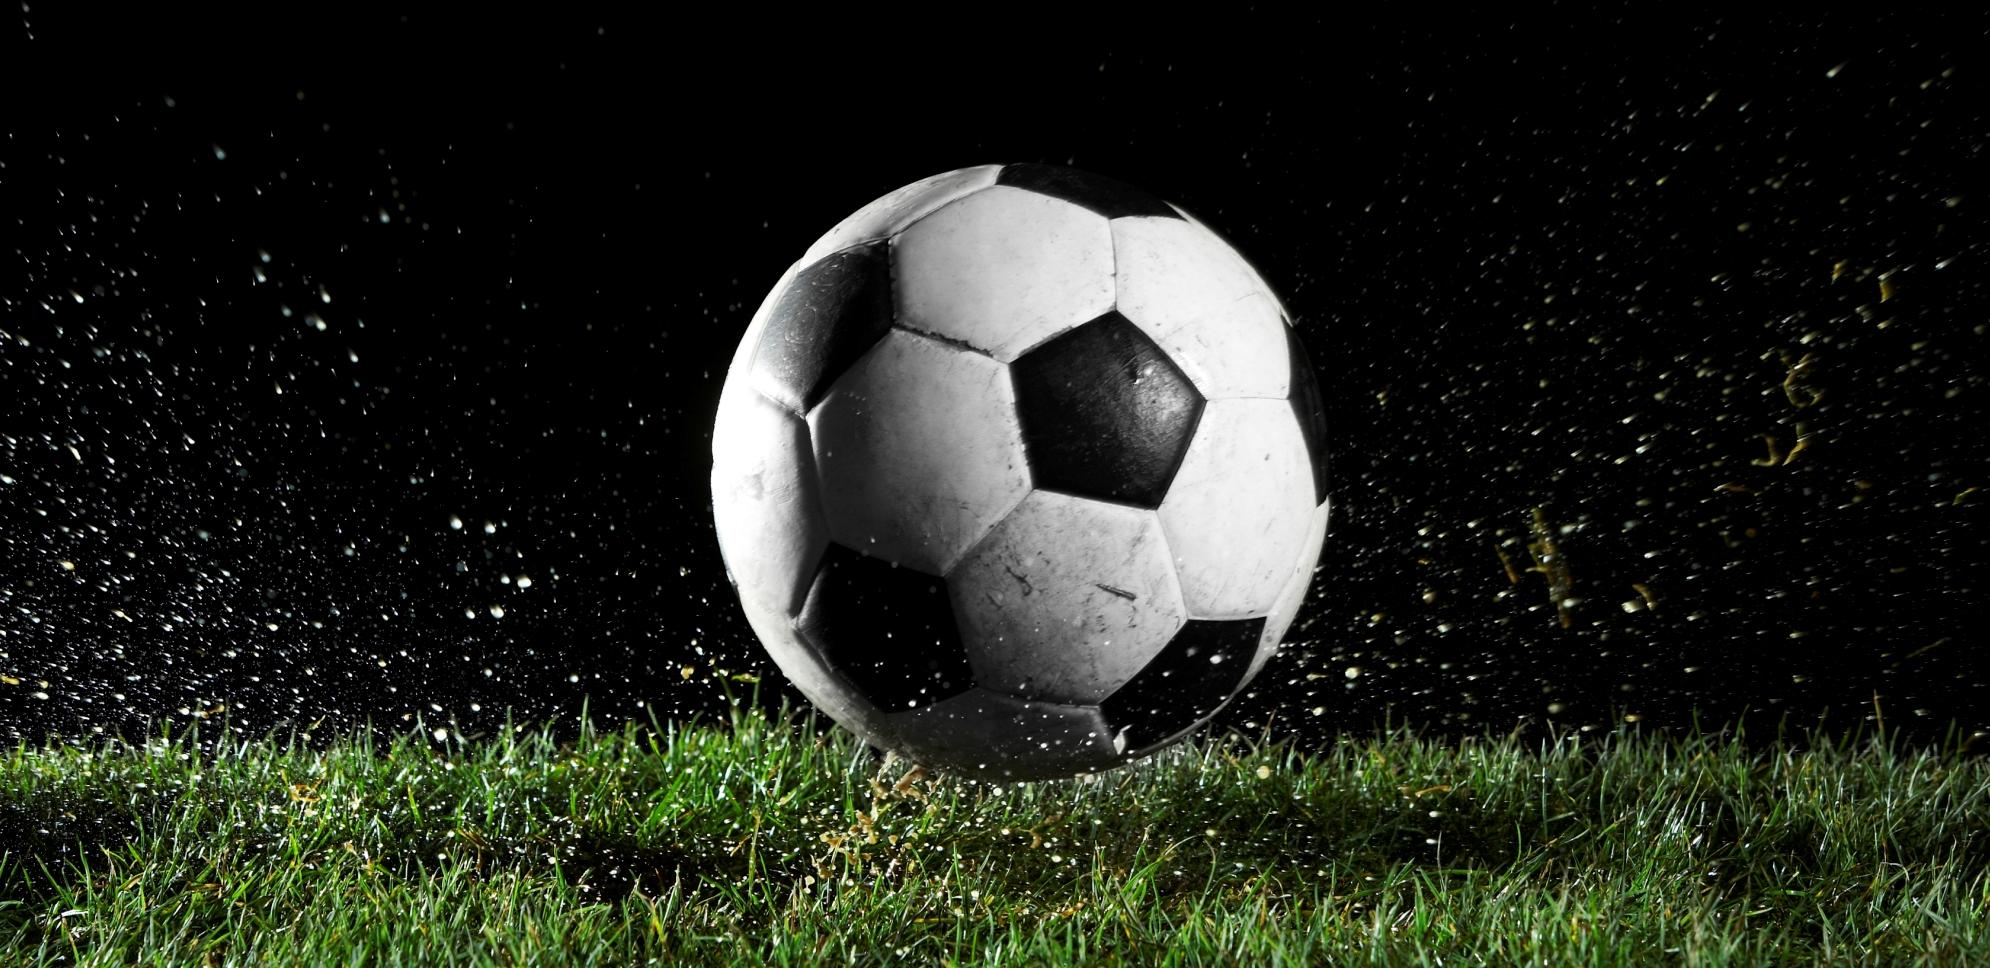 football tonite on tv first day of football season